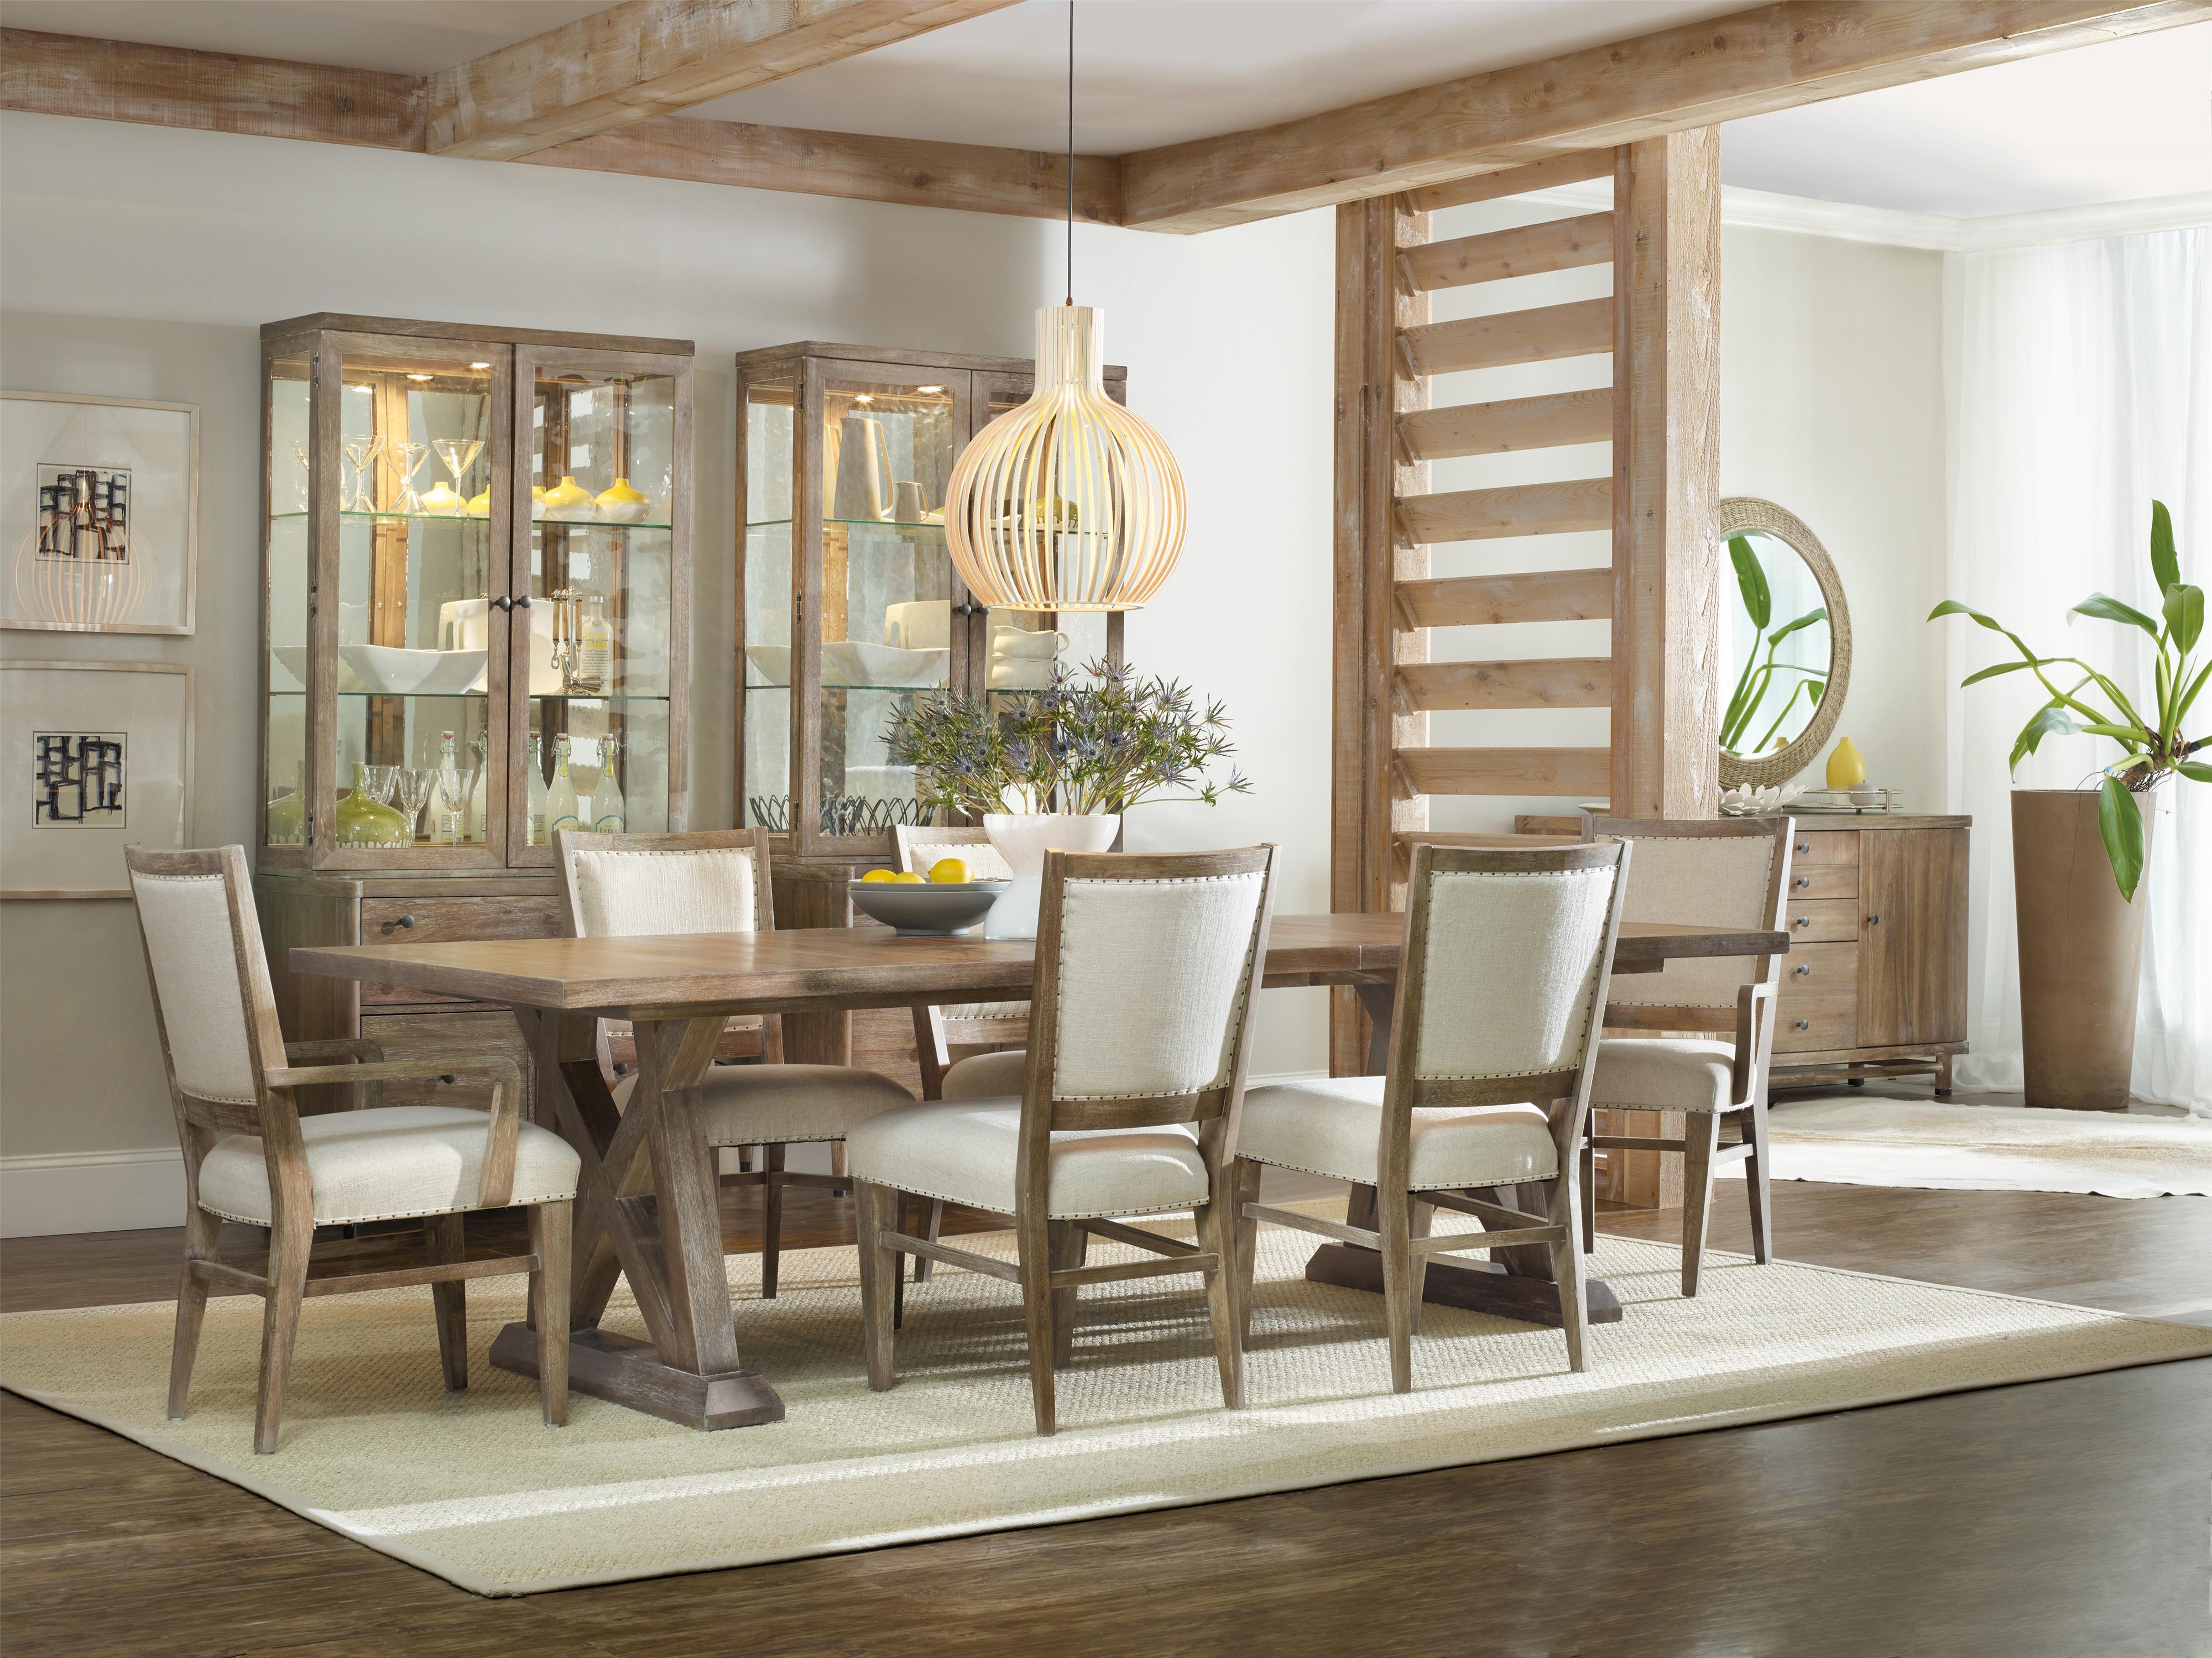 Hooker Furniture Studio 7H Geo Trestle Dining Table With X Pedestals    Belfort Furniture   Dining Tables